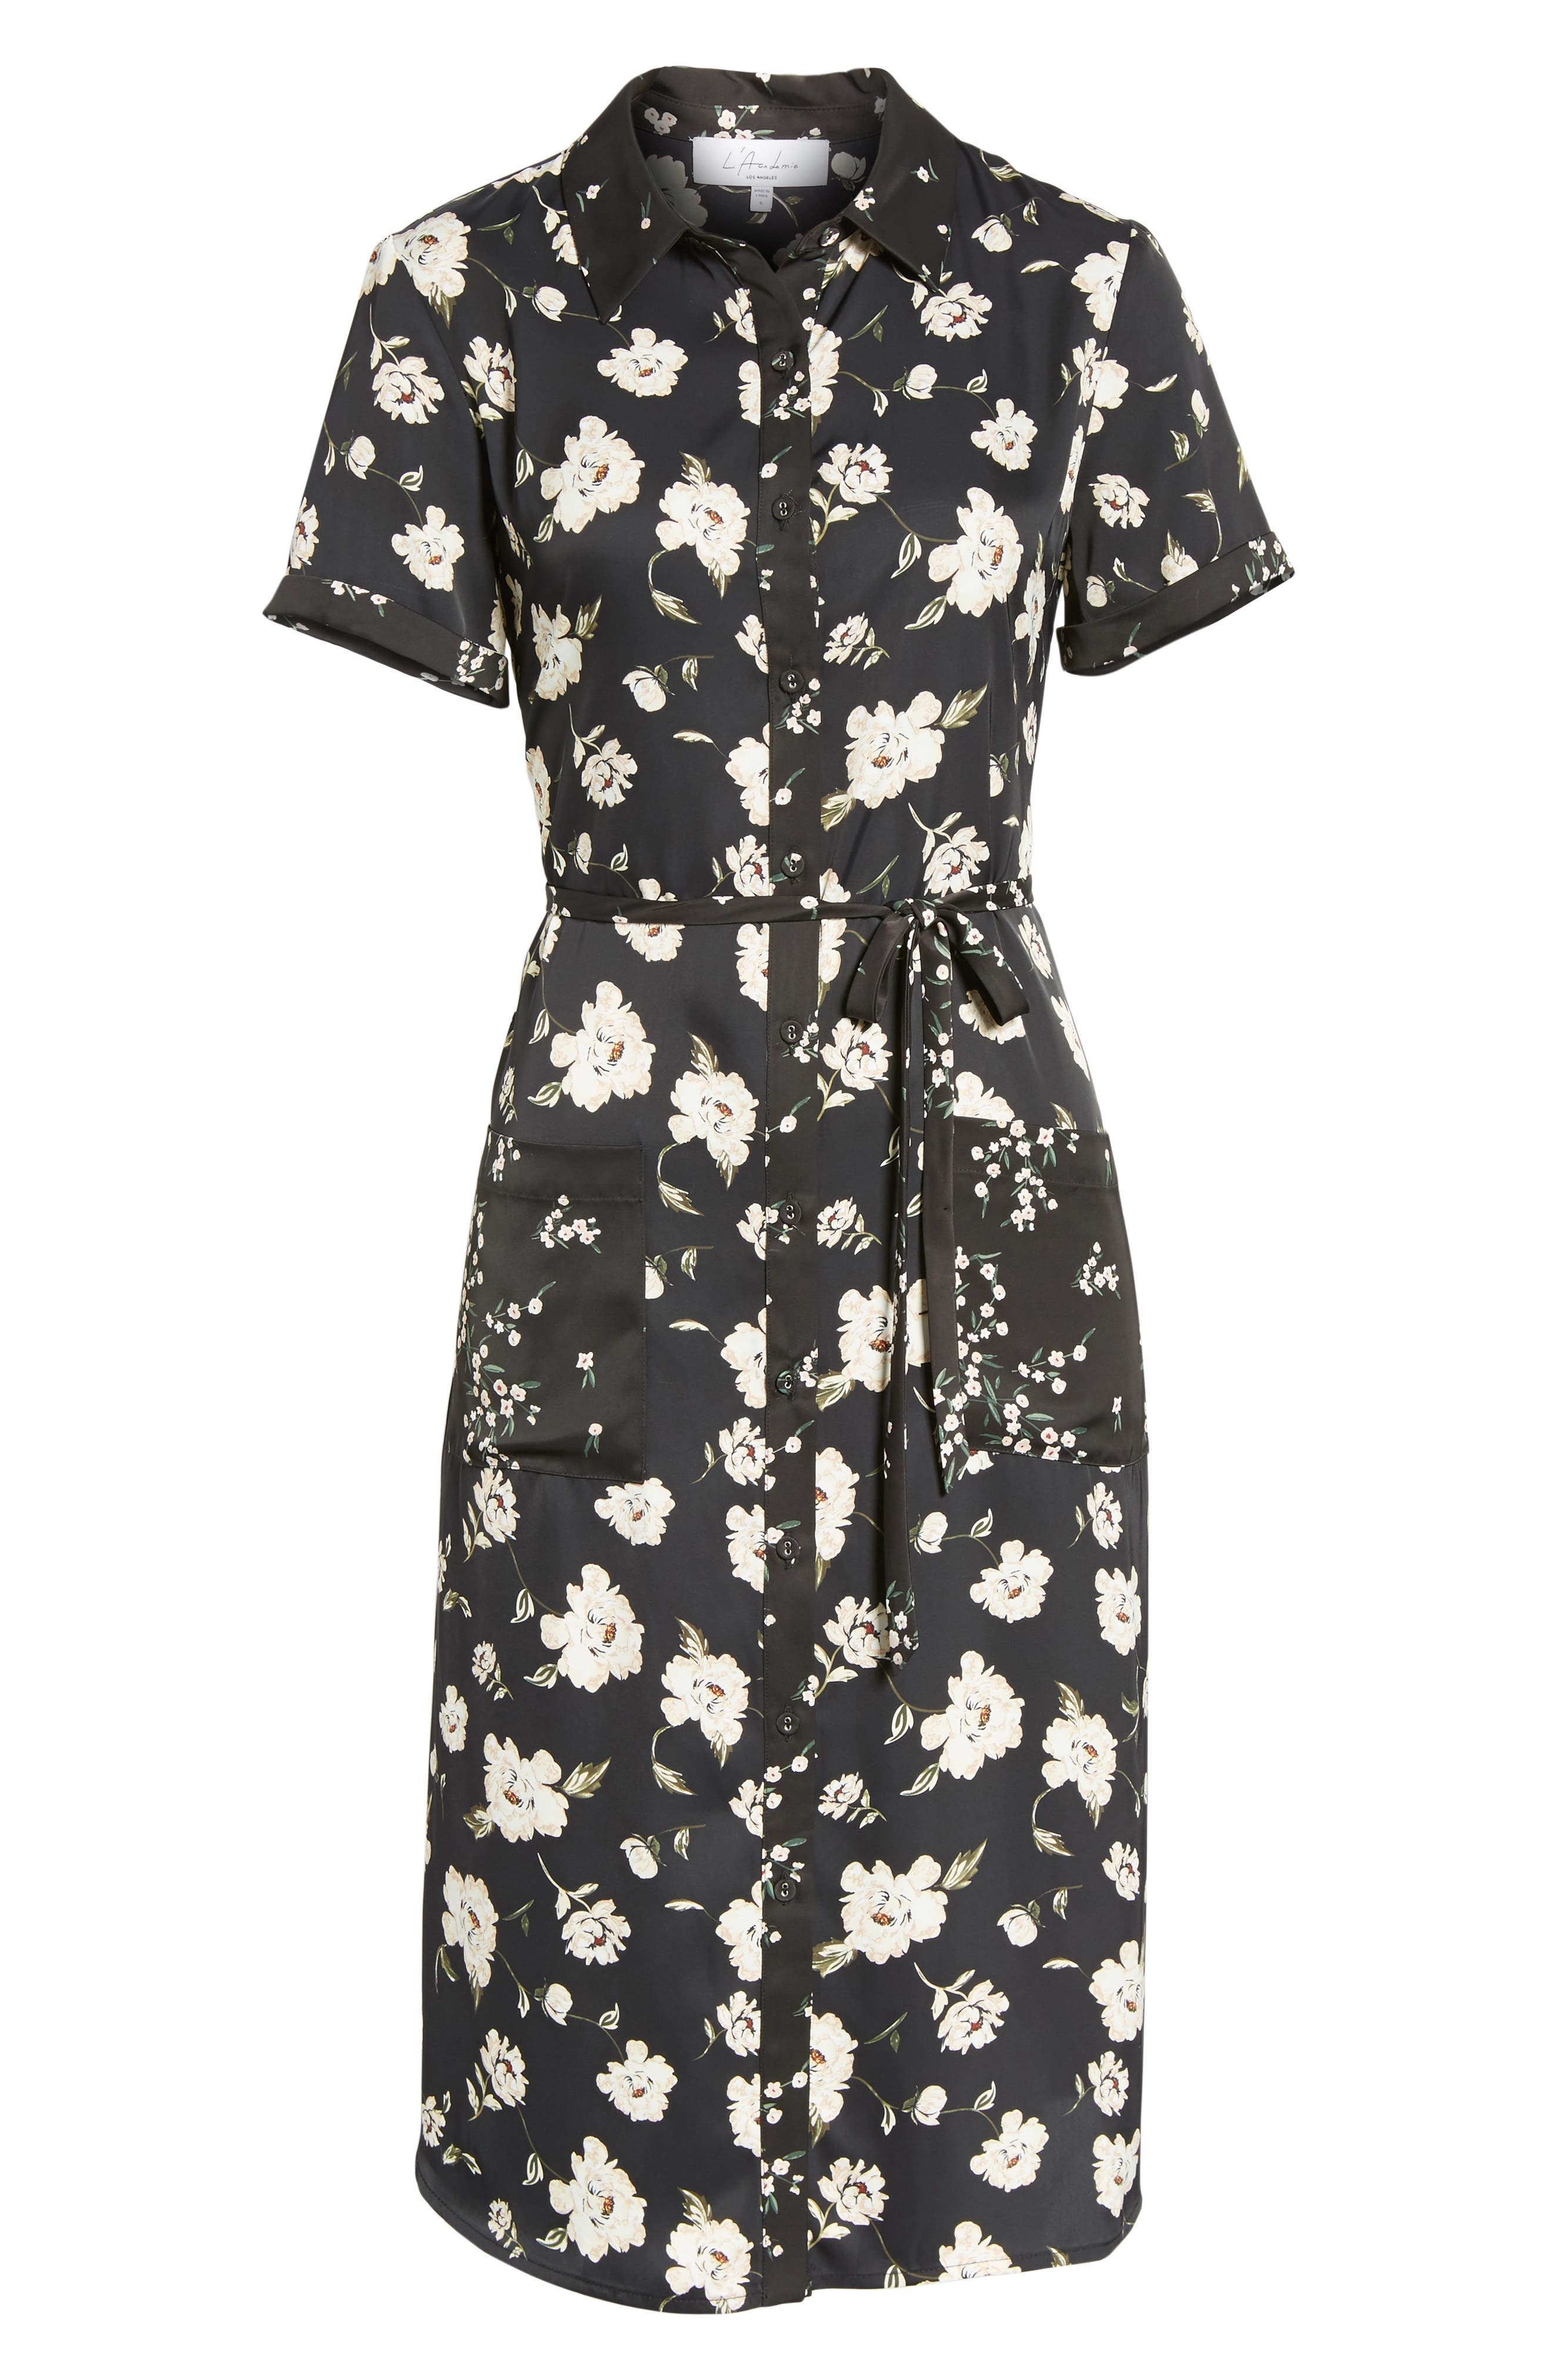 L'Academie The Shirt Dress Midi Dress,                             Alternate thumbnail 6, color,                             001